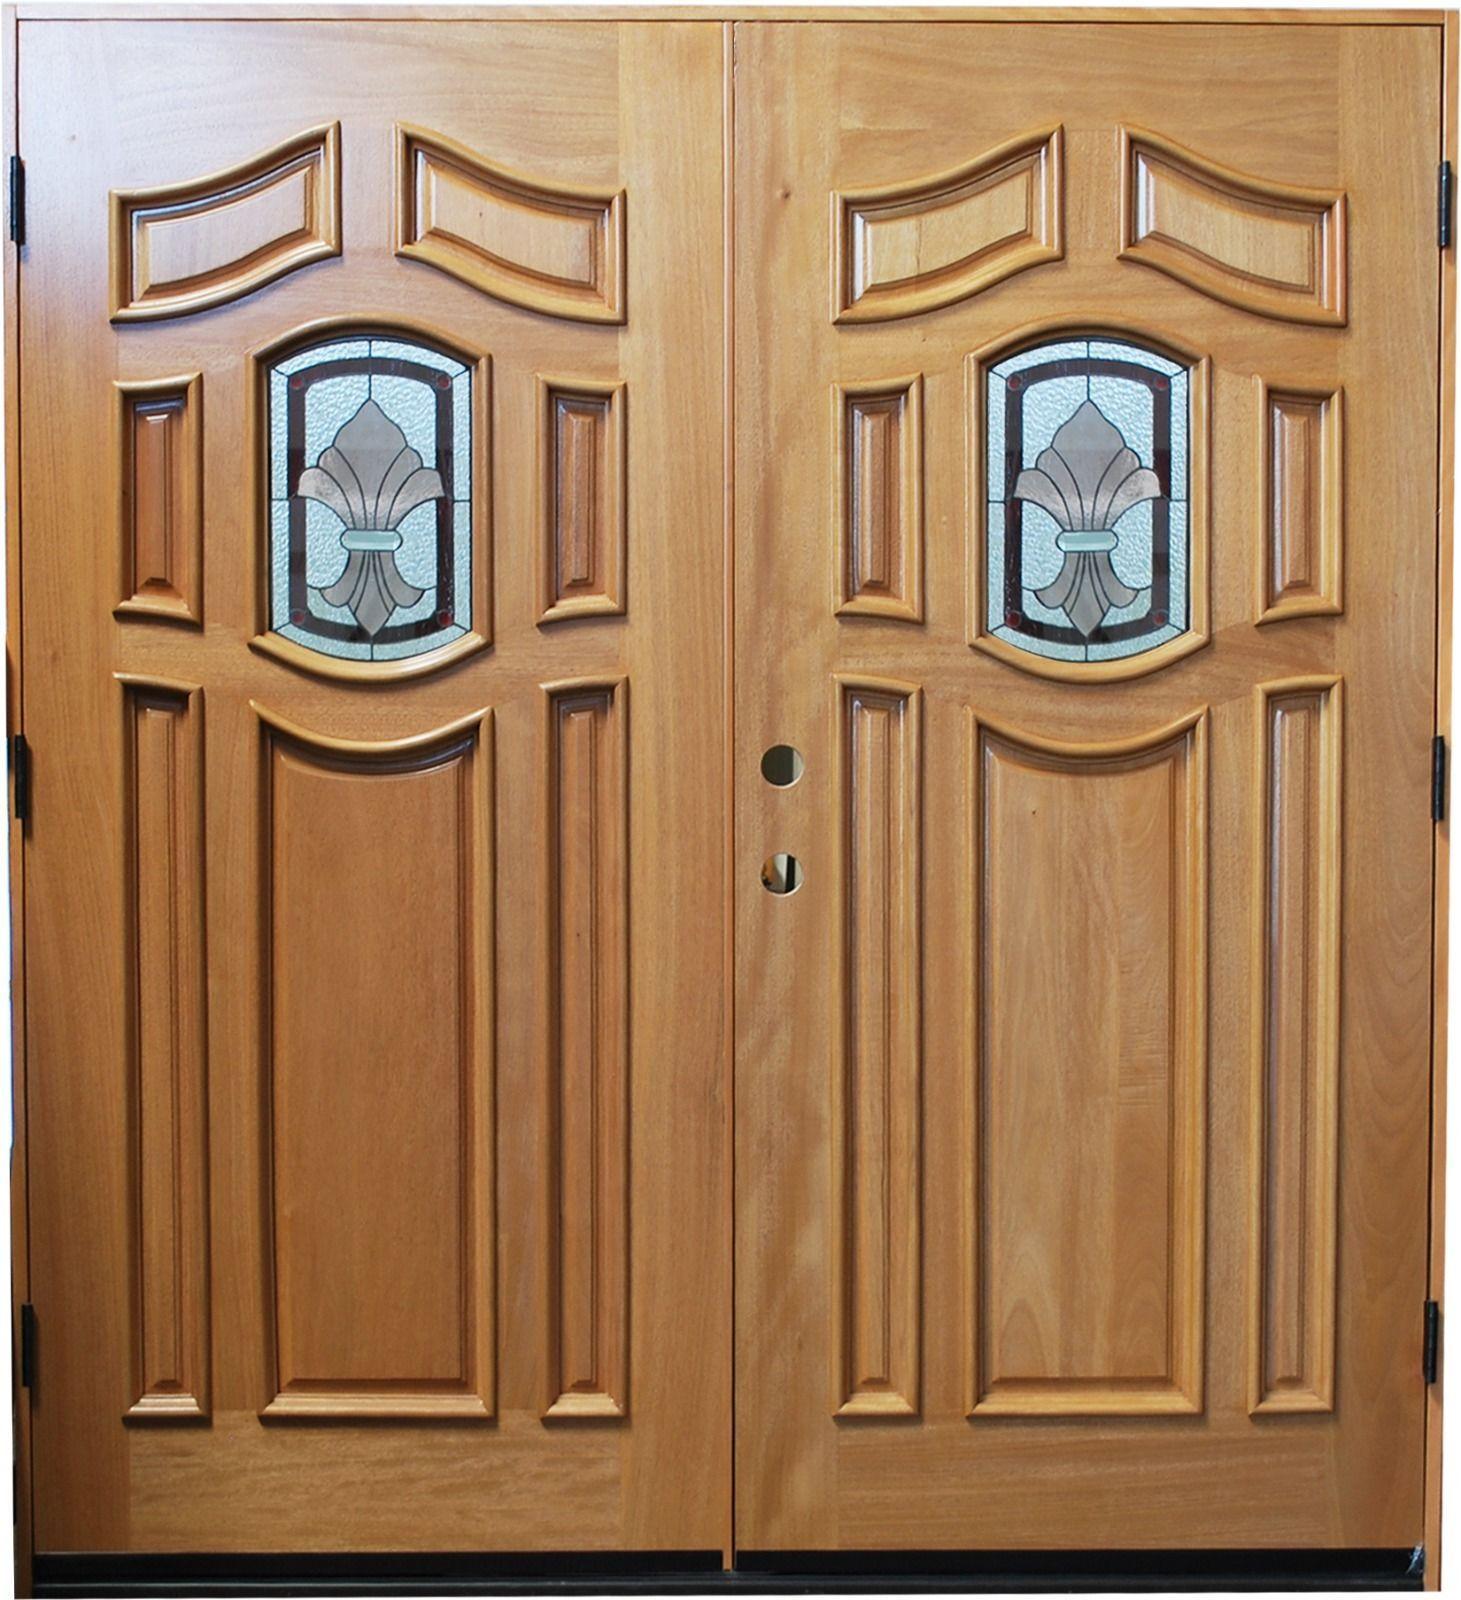 6 39 X 6 39 8 Exterior Front Entry Door With 2 Tone Finish Doors